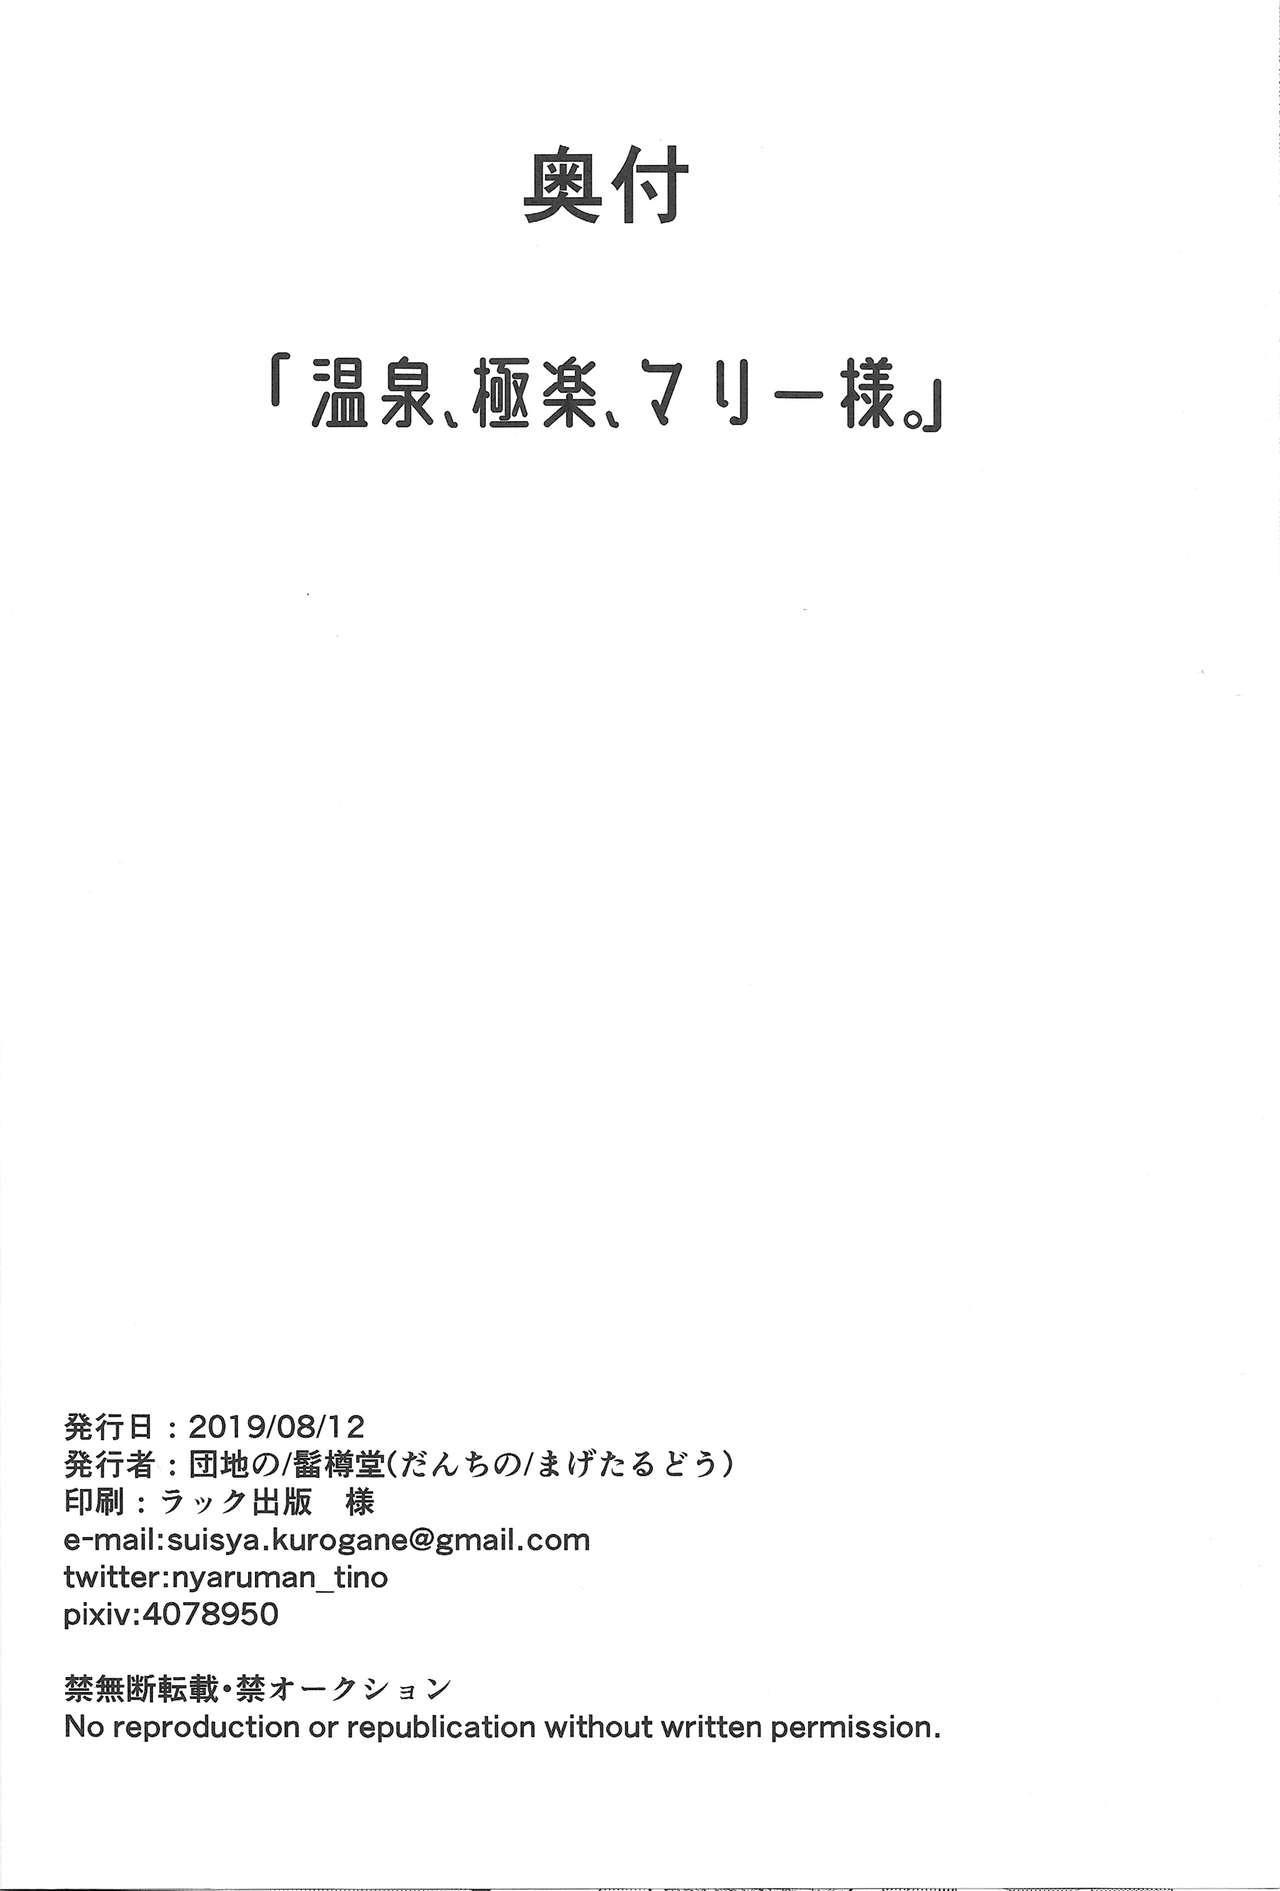 Onsen, Gokuraku, Marie-sama. 24